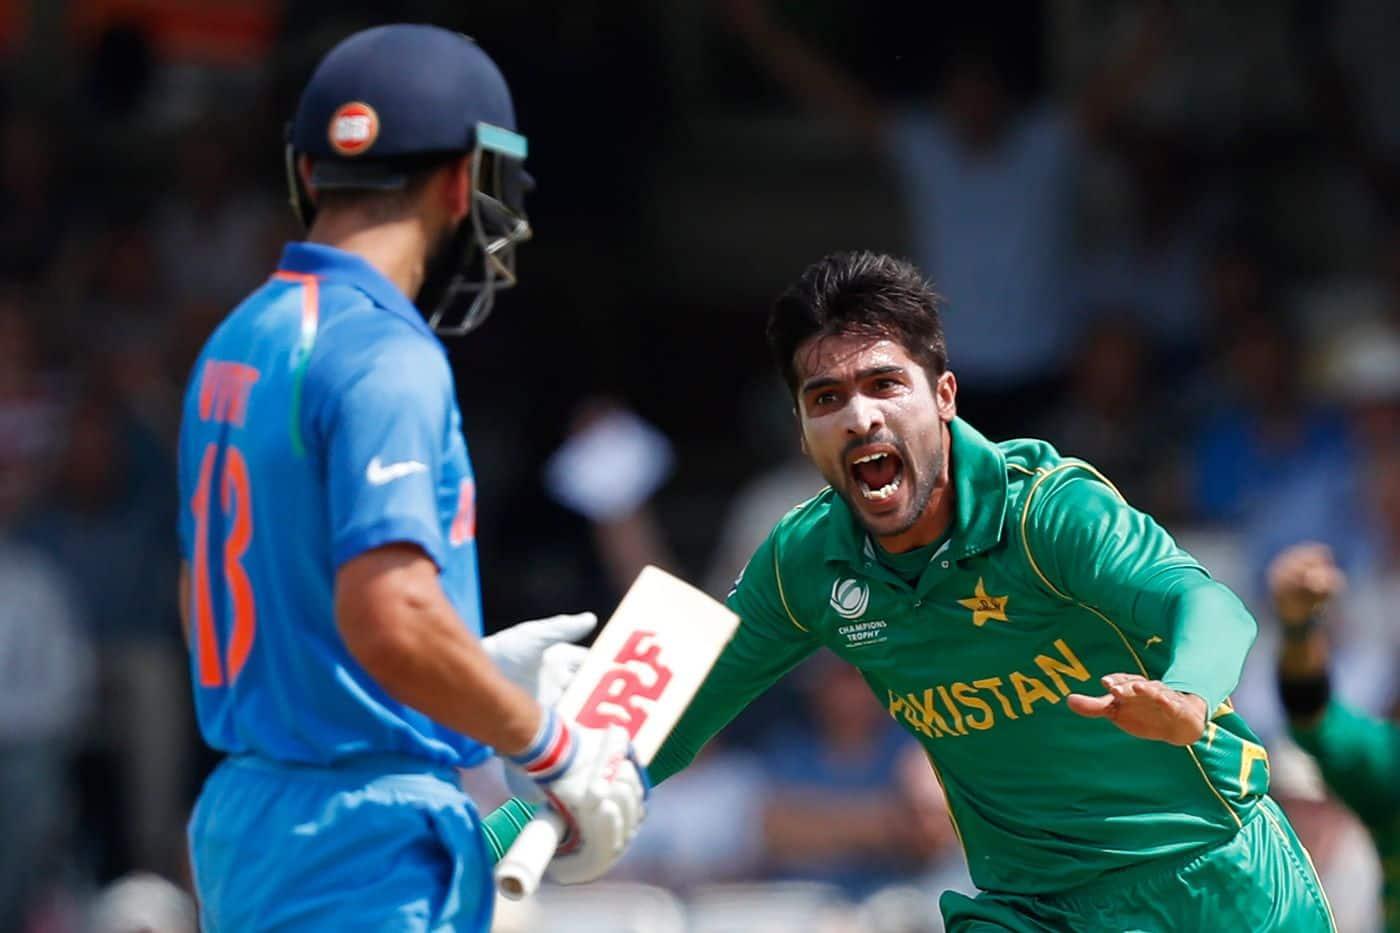 India vs Pakistan: Ajit Agarkar reckons Pakistan have the edge